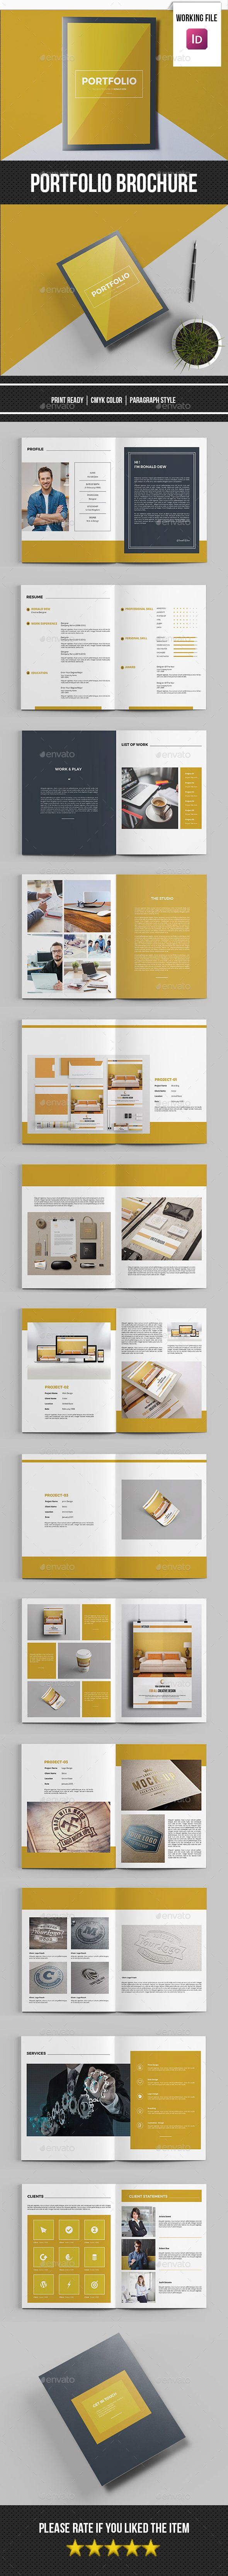 Minimal Portfolio Brochure Template InDesign INDD 23